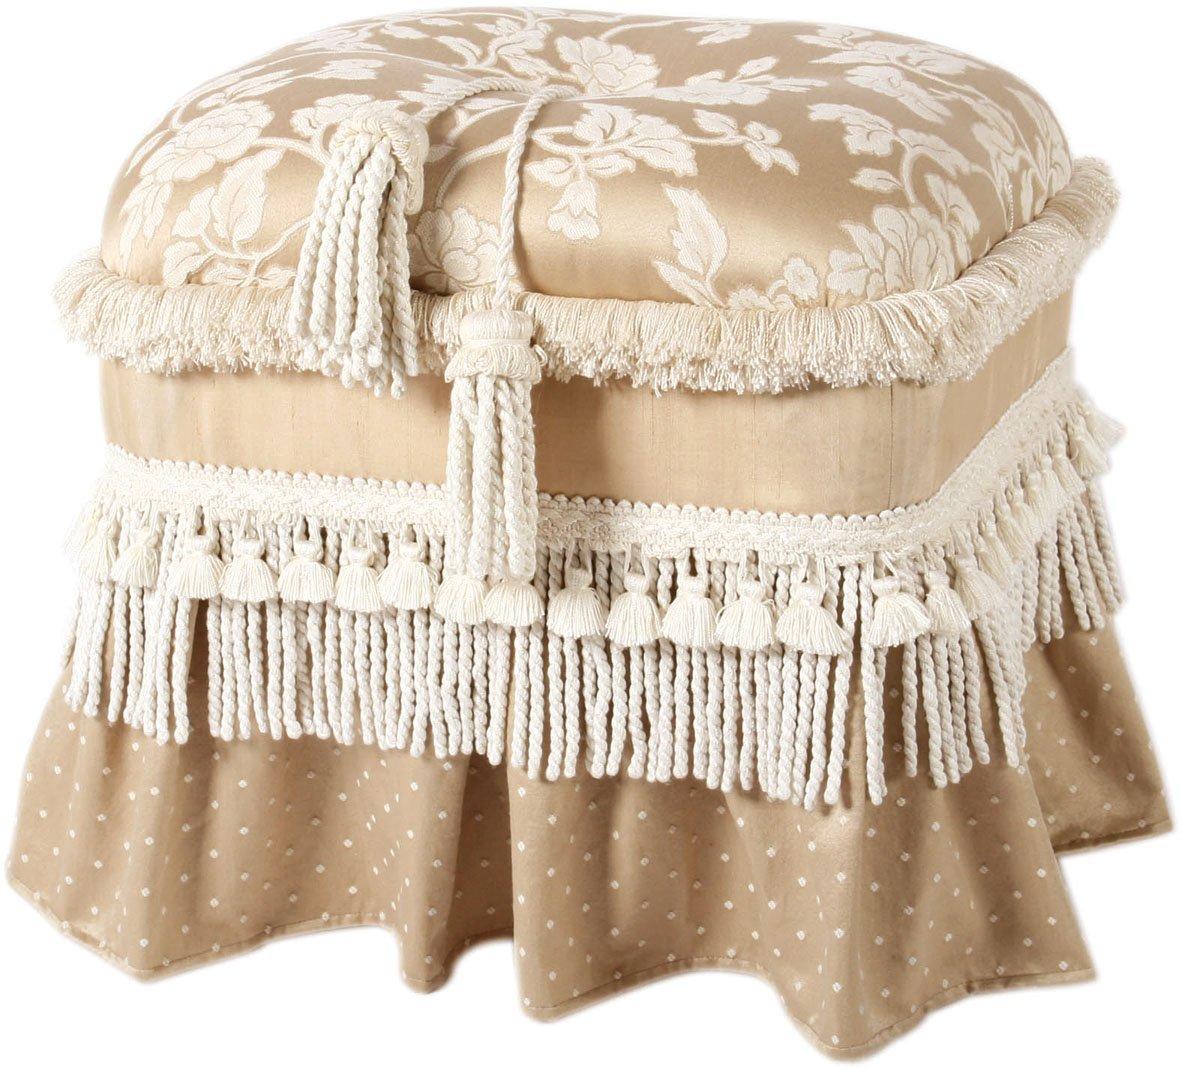 Jennifer Taylor Home Cassandra Brush Fringe And Trim Tassels With Skirt Ottoman, 19 x 18 x 15 , Beige